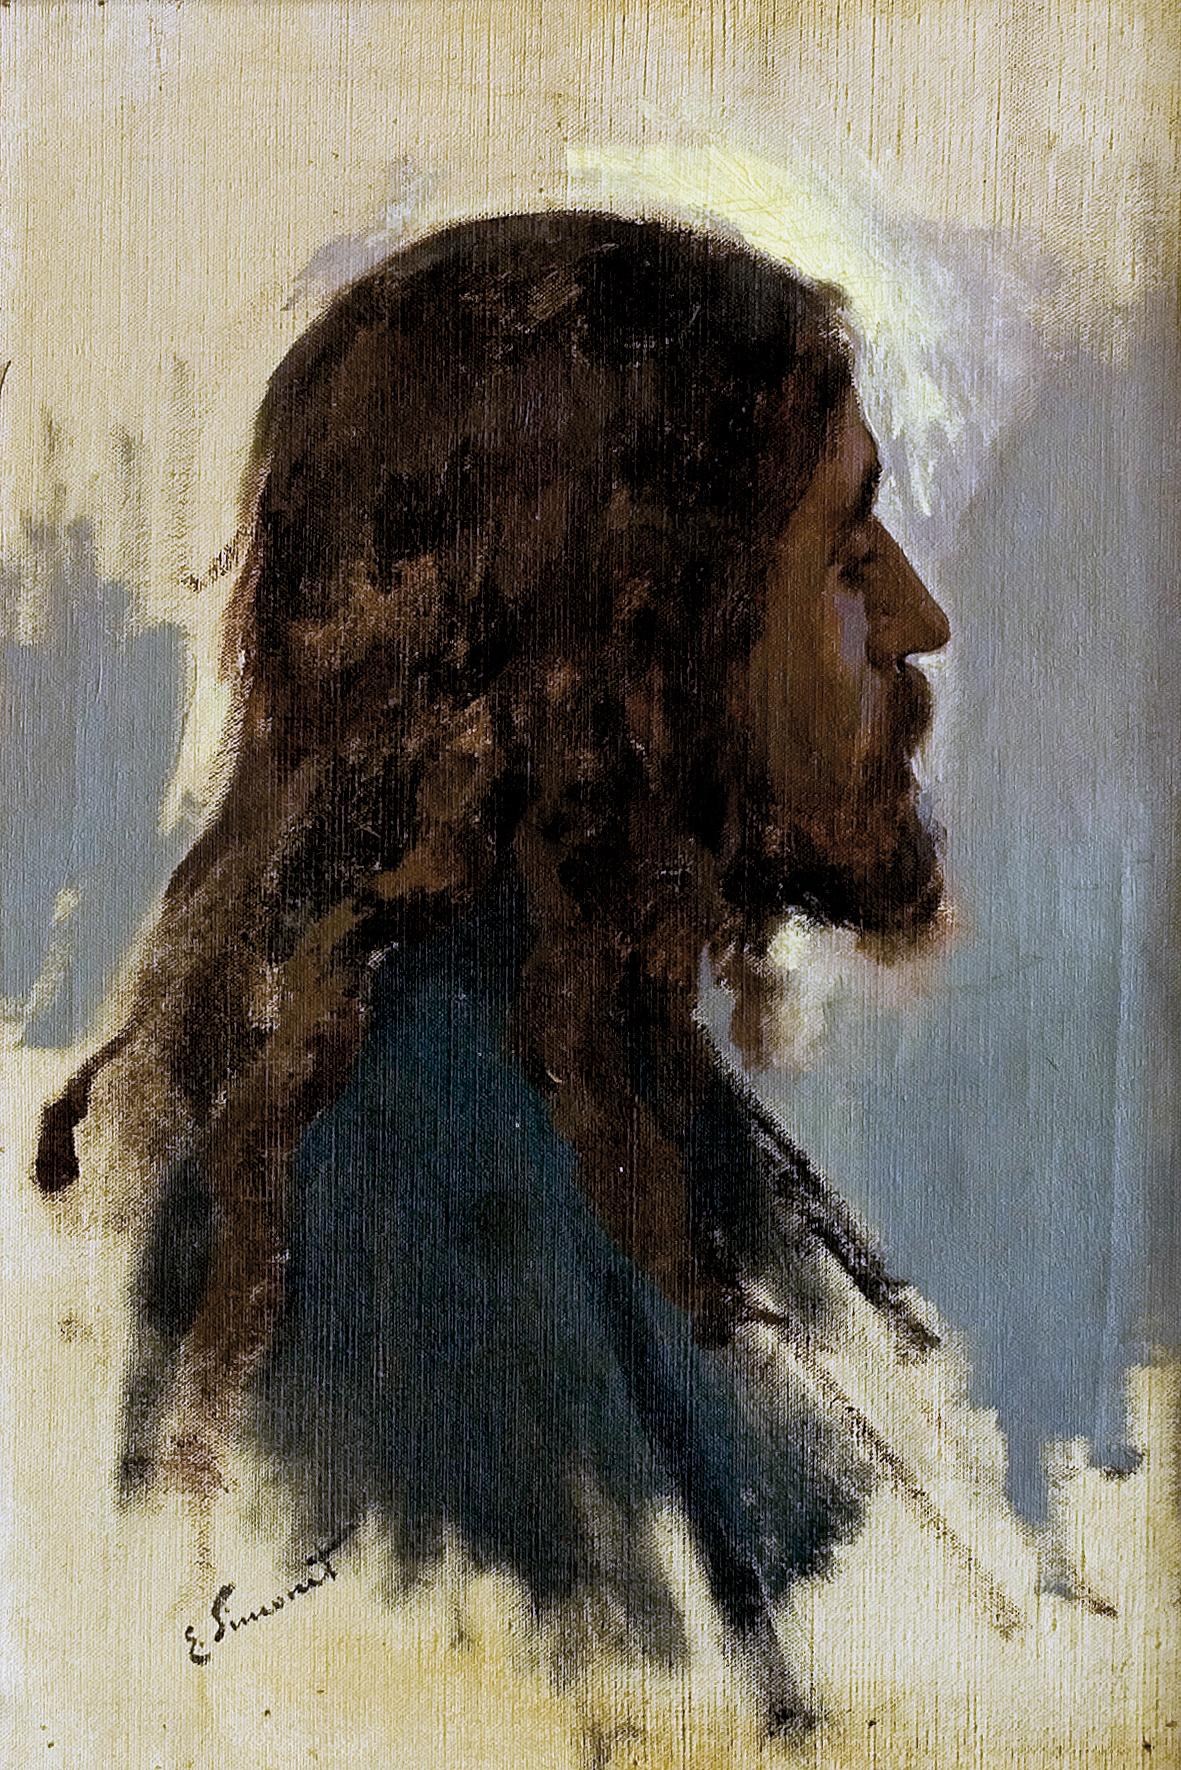 Enrique Simonet - Cabeza de Jesús.jpg